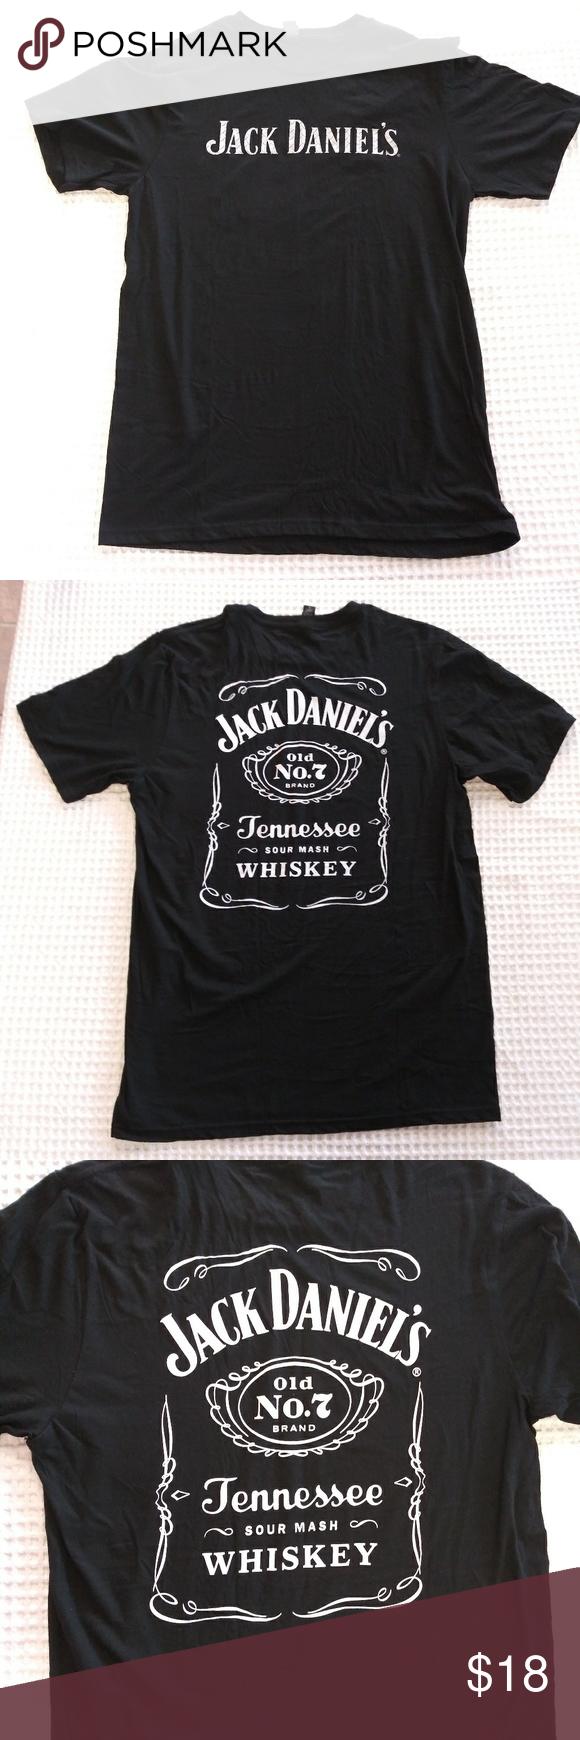 Jack Daniels T Shirt Men S Large Black 2 Sided Mens Tshirts Mens Shirts Shirts [ 1740 x 580 Pixel ]